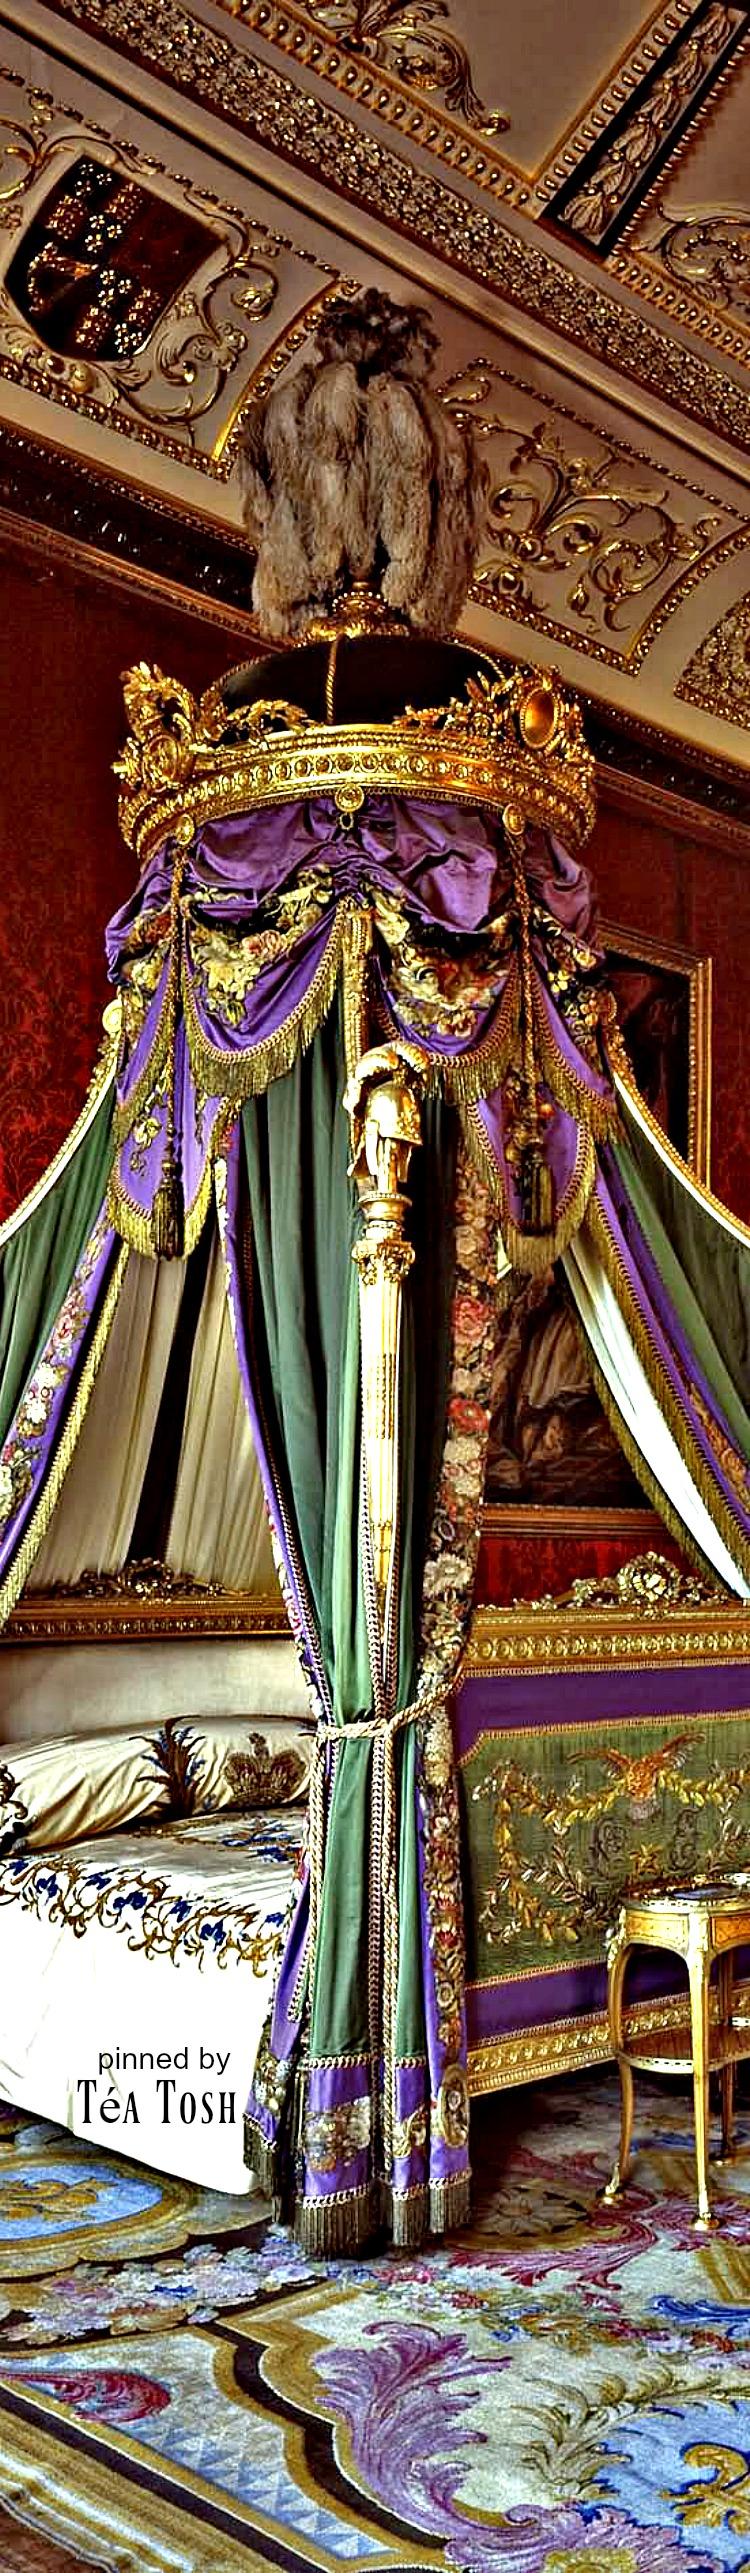 ❇téa tosh❇ amazing inside view of the buckingham palace